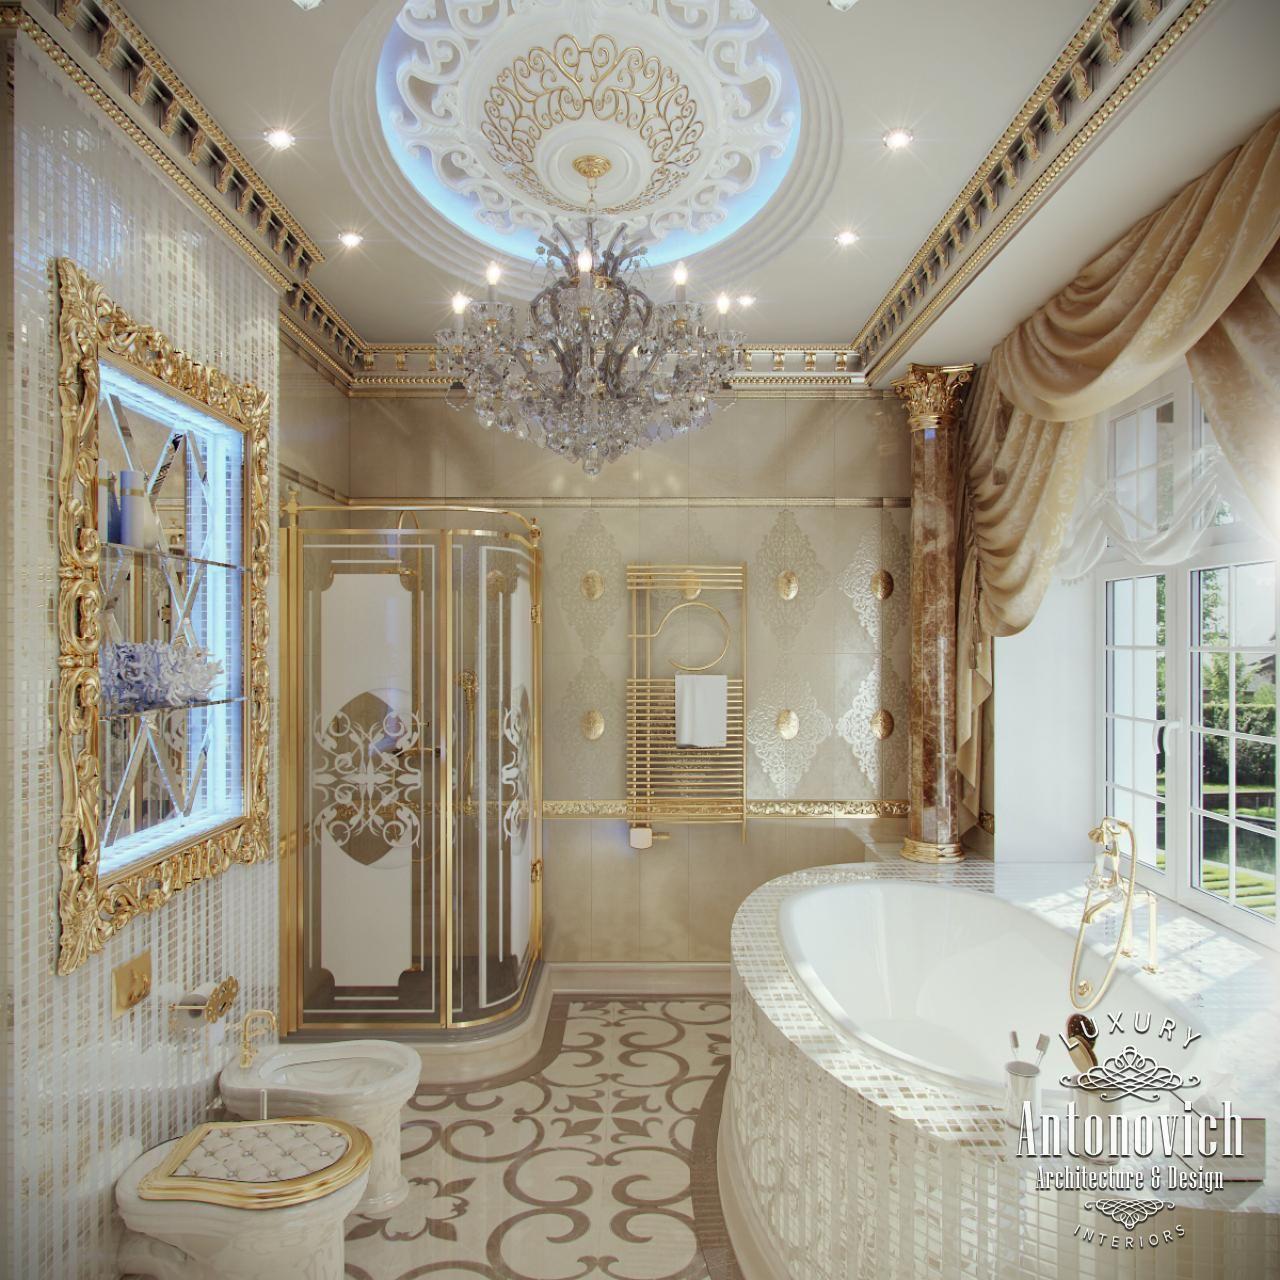 Bathroom Designs Dubai bathroom design in dubai, classical bathroom, photo 3 | arabic